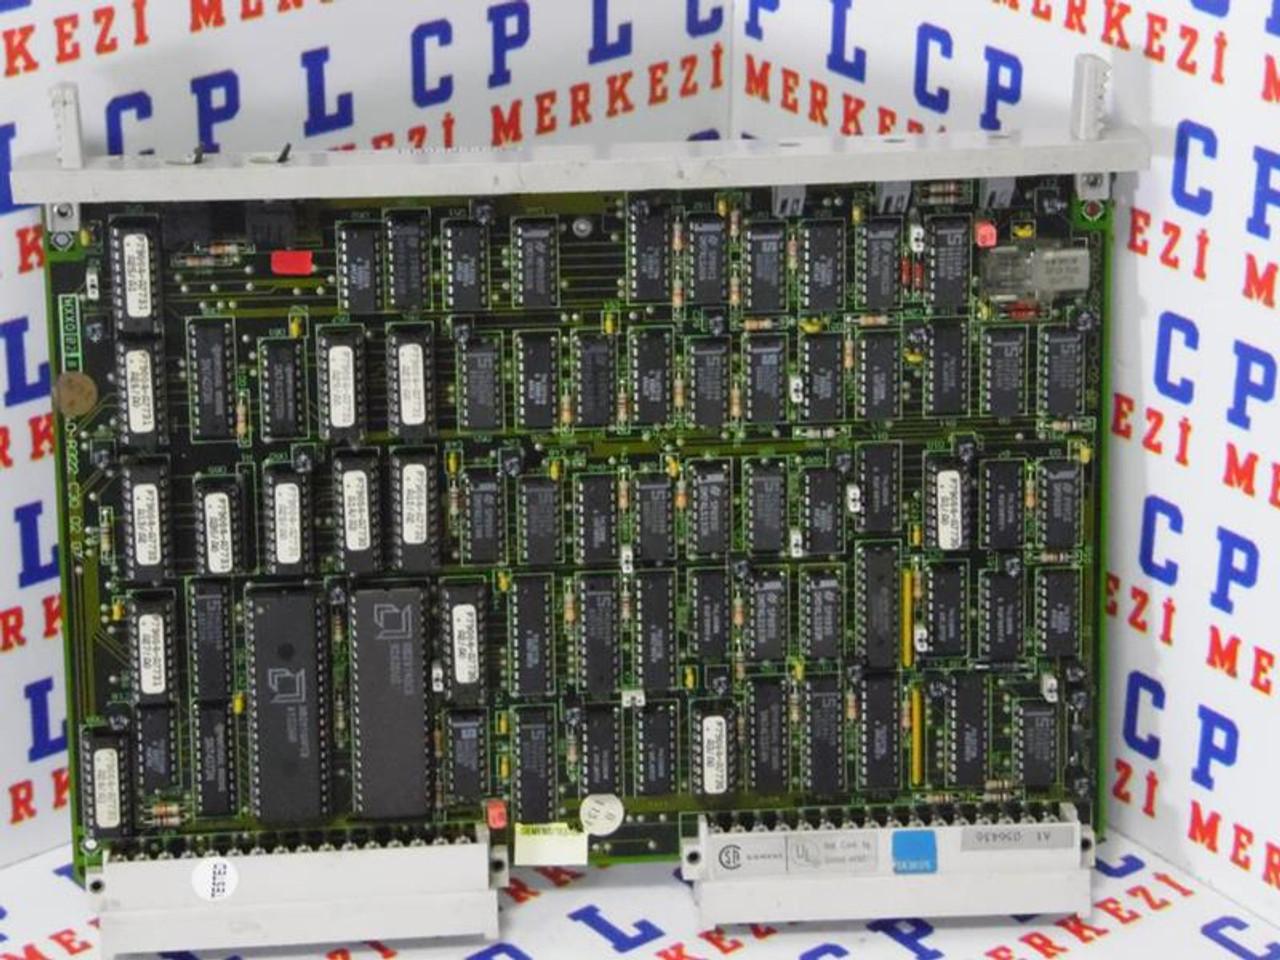 Siemens SIMATIC s5 CPU 924,6es5924-3sa12,6es5 924-3sa12